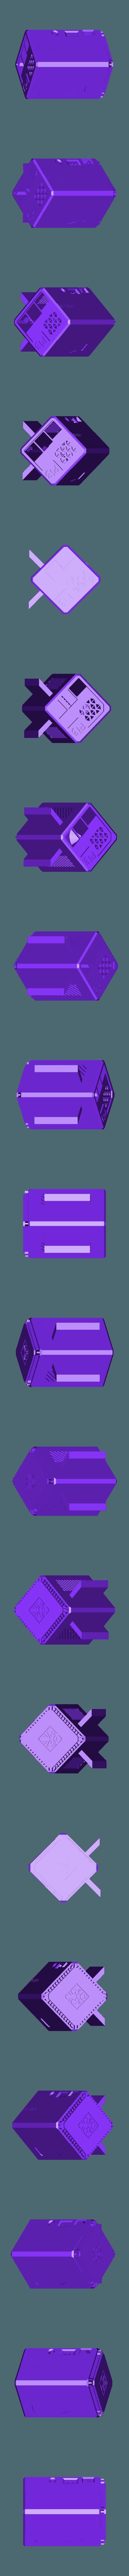 Pi_Omen_case.stl Download free STL file Raspberry Pi 3 OMEN Accelerator Case • 3D printable object, Chaco